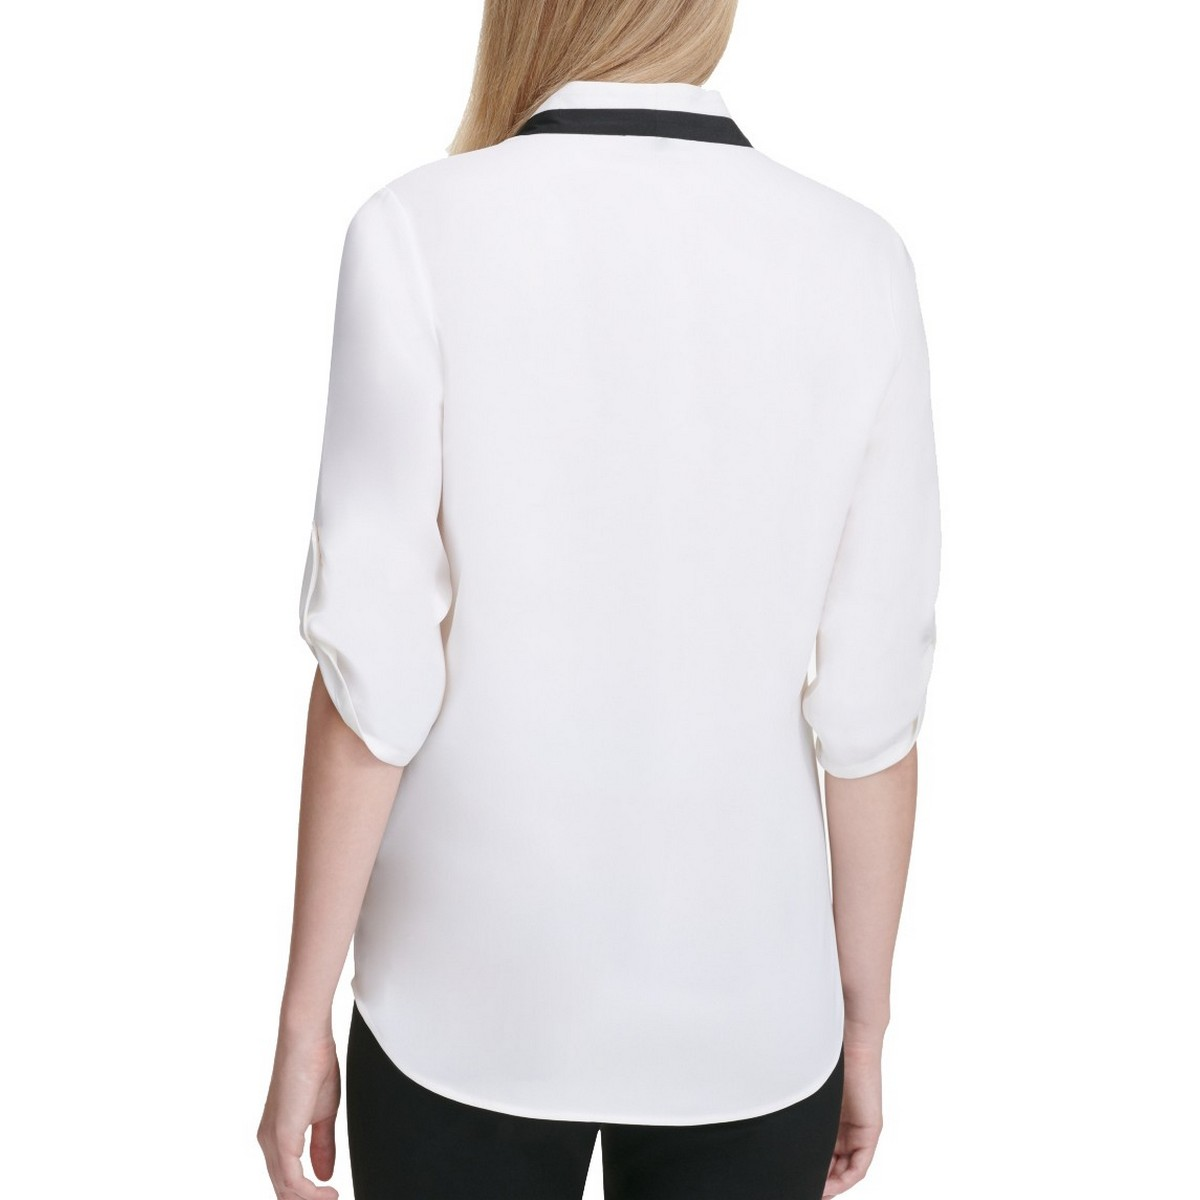 CALVIN-KLEIN-NEW-Women-039-s-Contrast-neck-Roll-tab-sleeve-Blouse-Shirt-Top-TEDO thumbnail 5